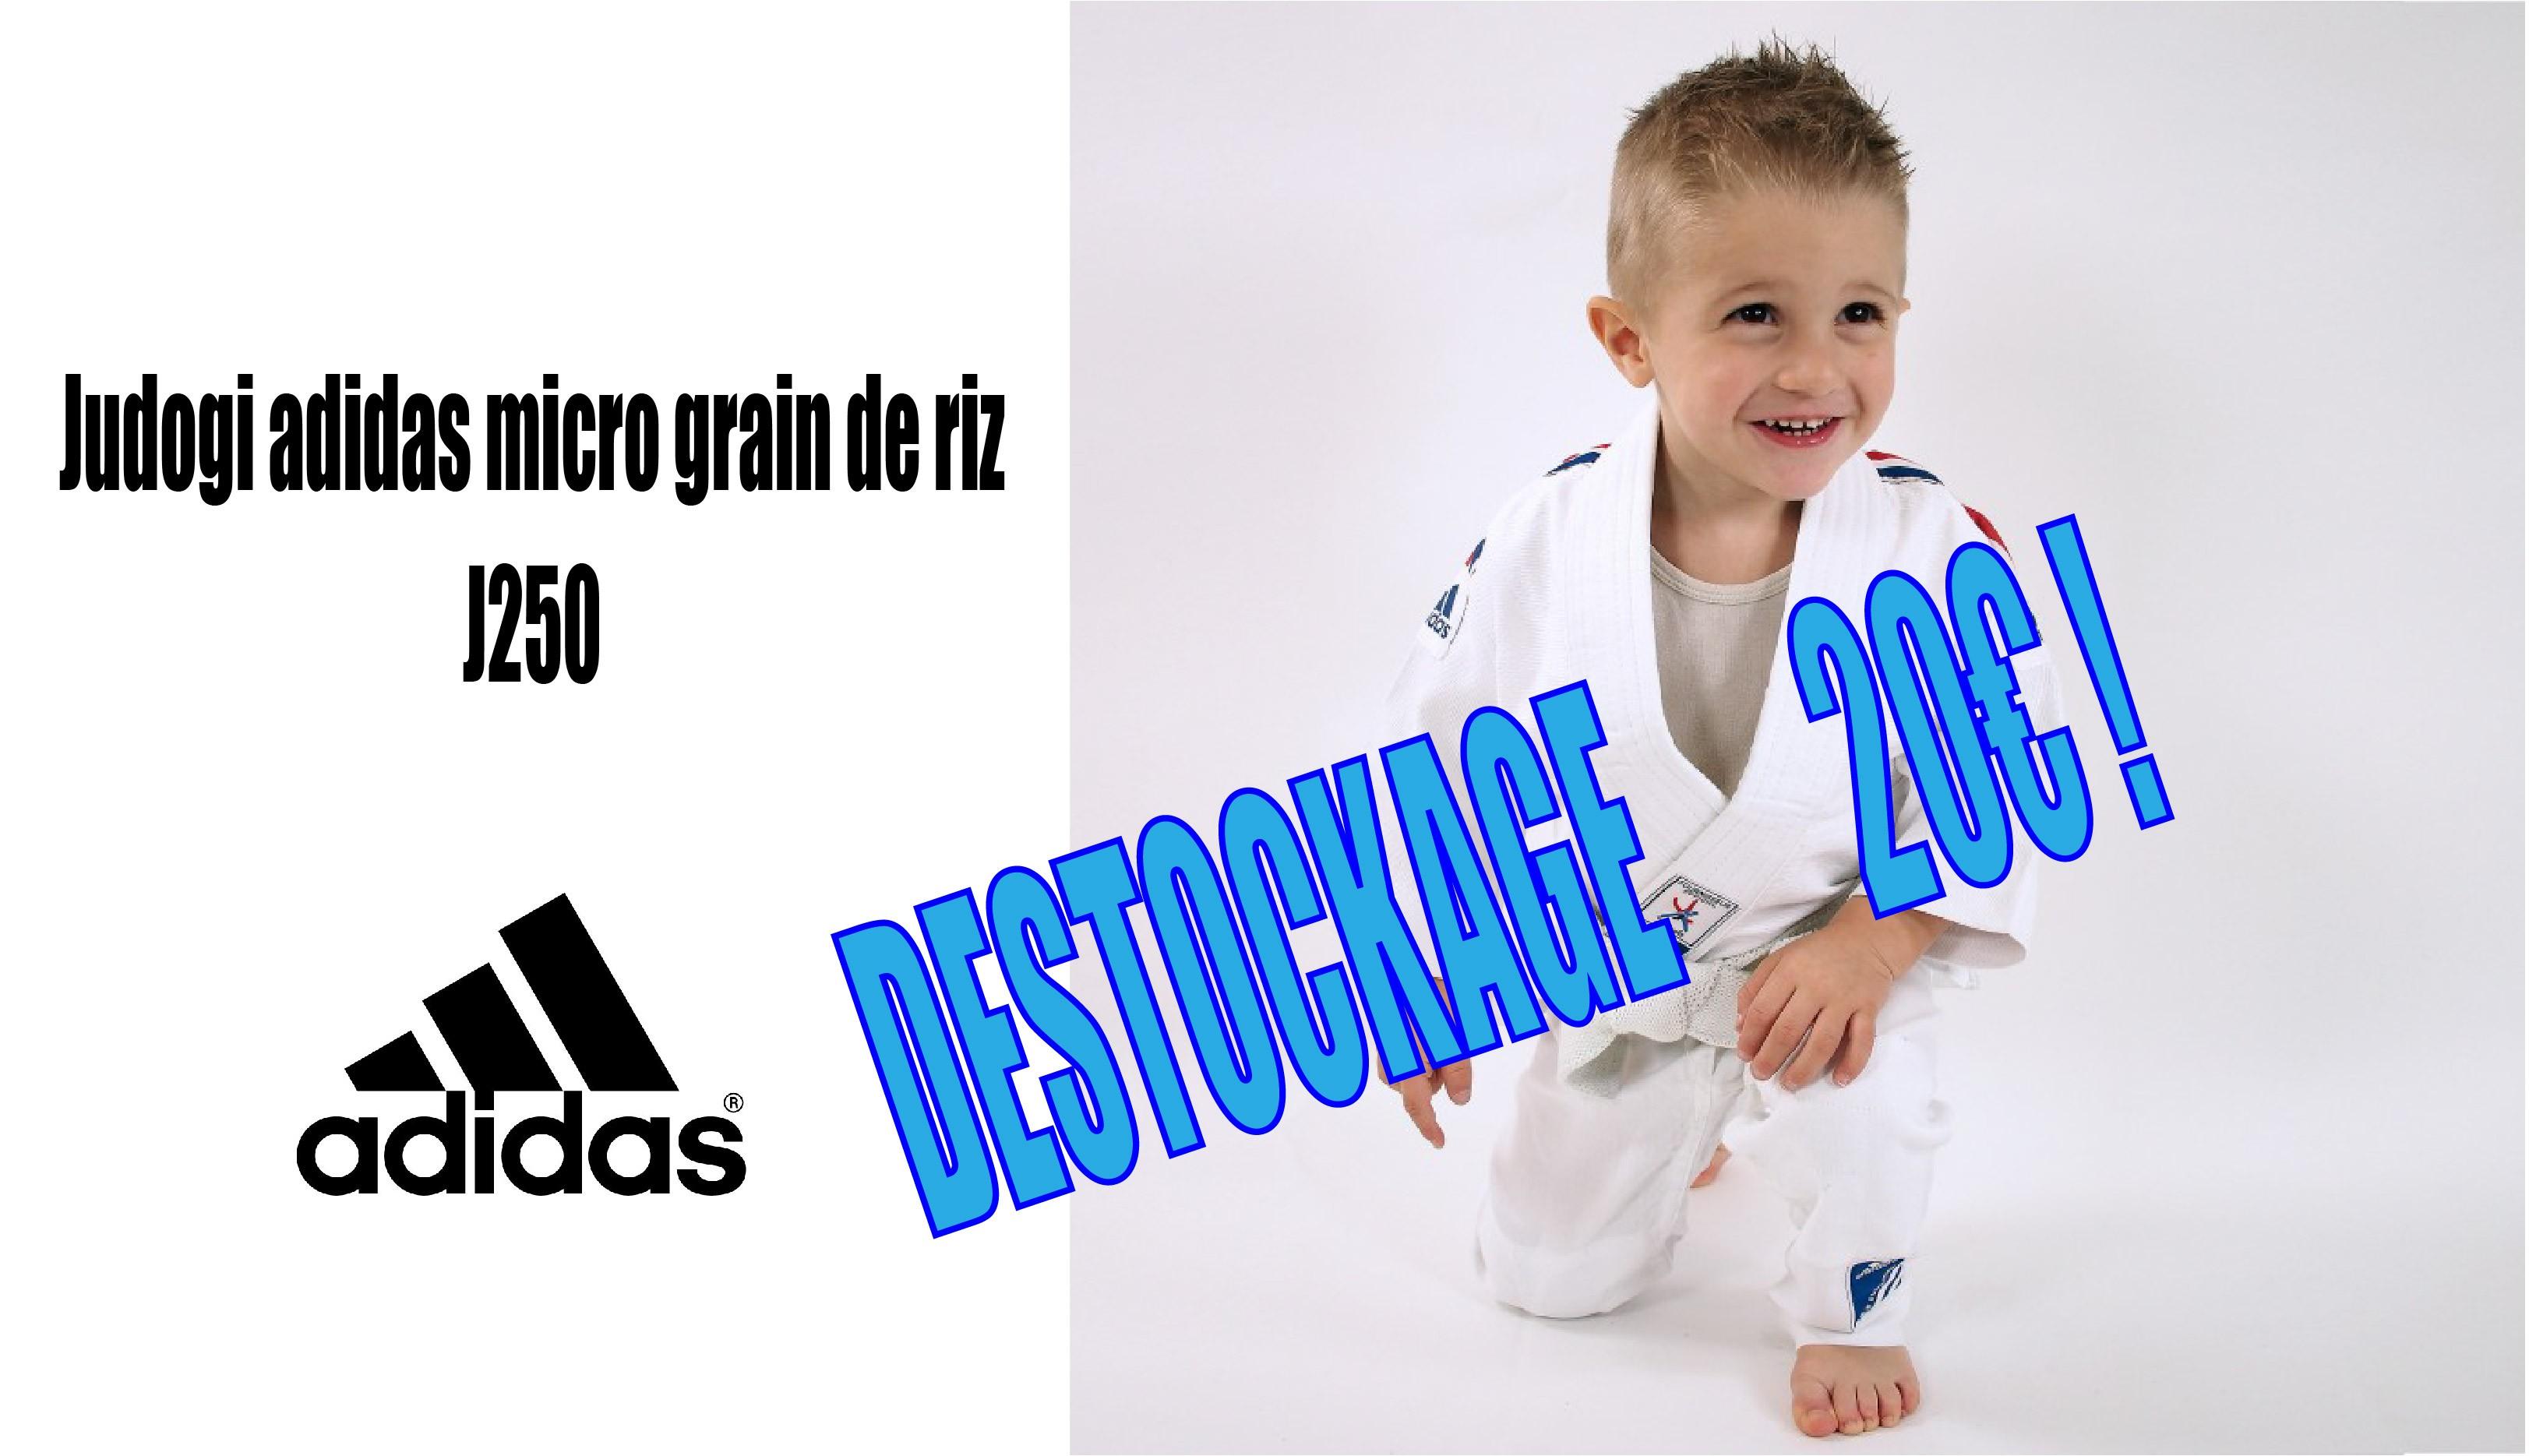 Judogi J250 à 20 €